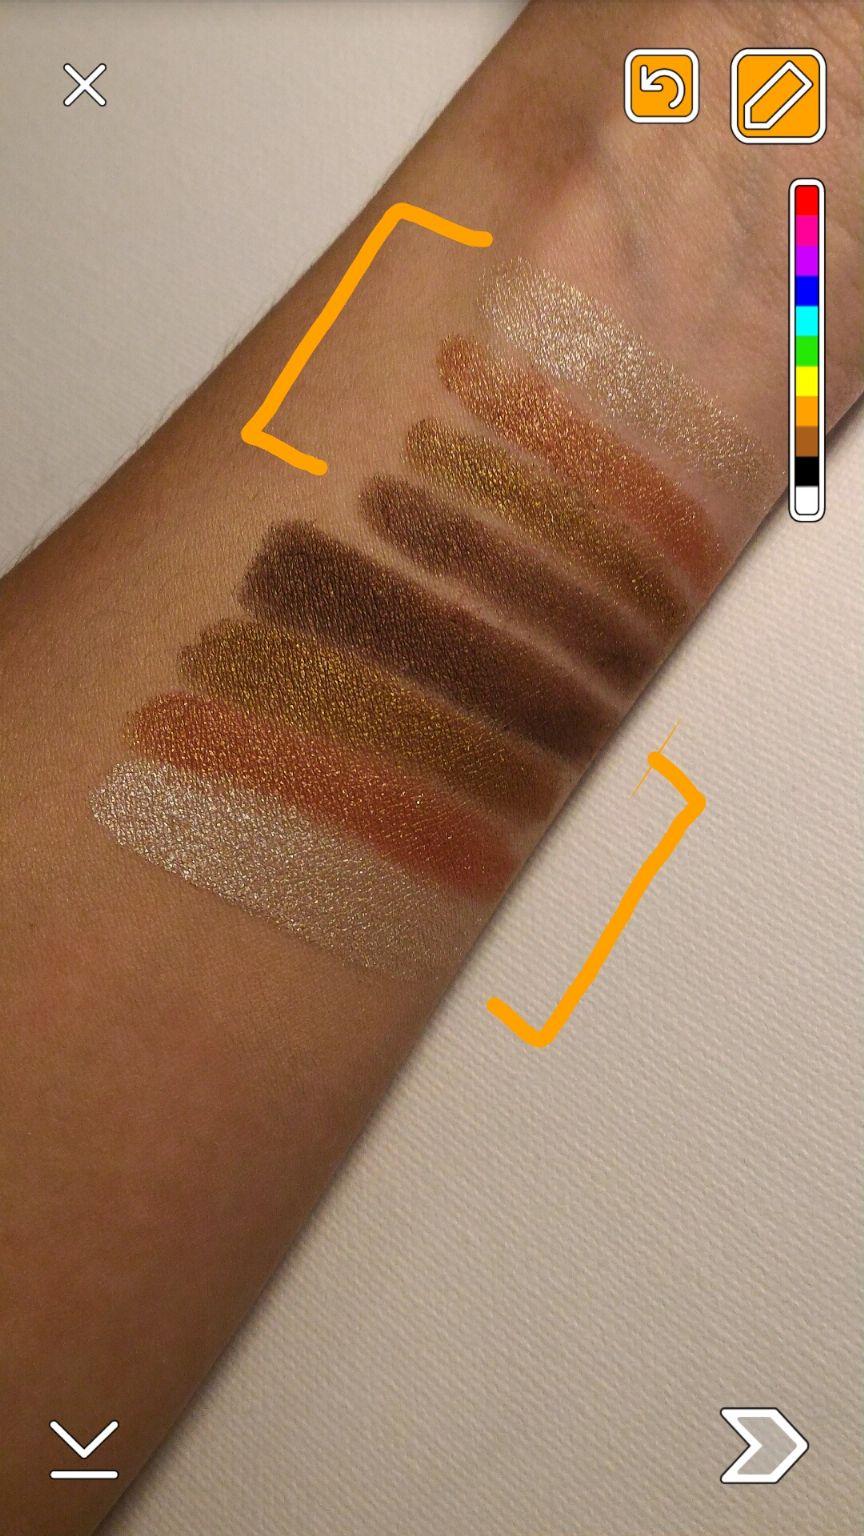 EyeStudio Color Plush Silk Eyeshadow Quad - Pink Persuasion by Maybelline #11